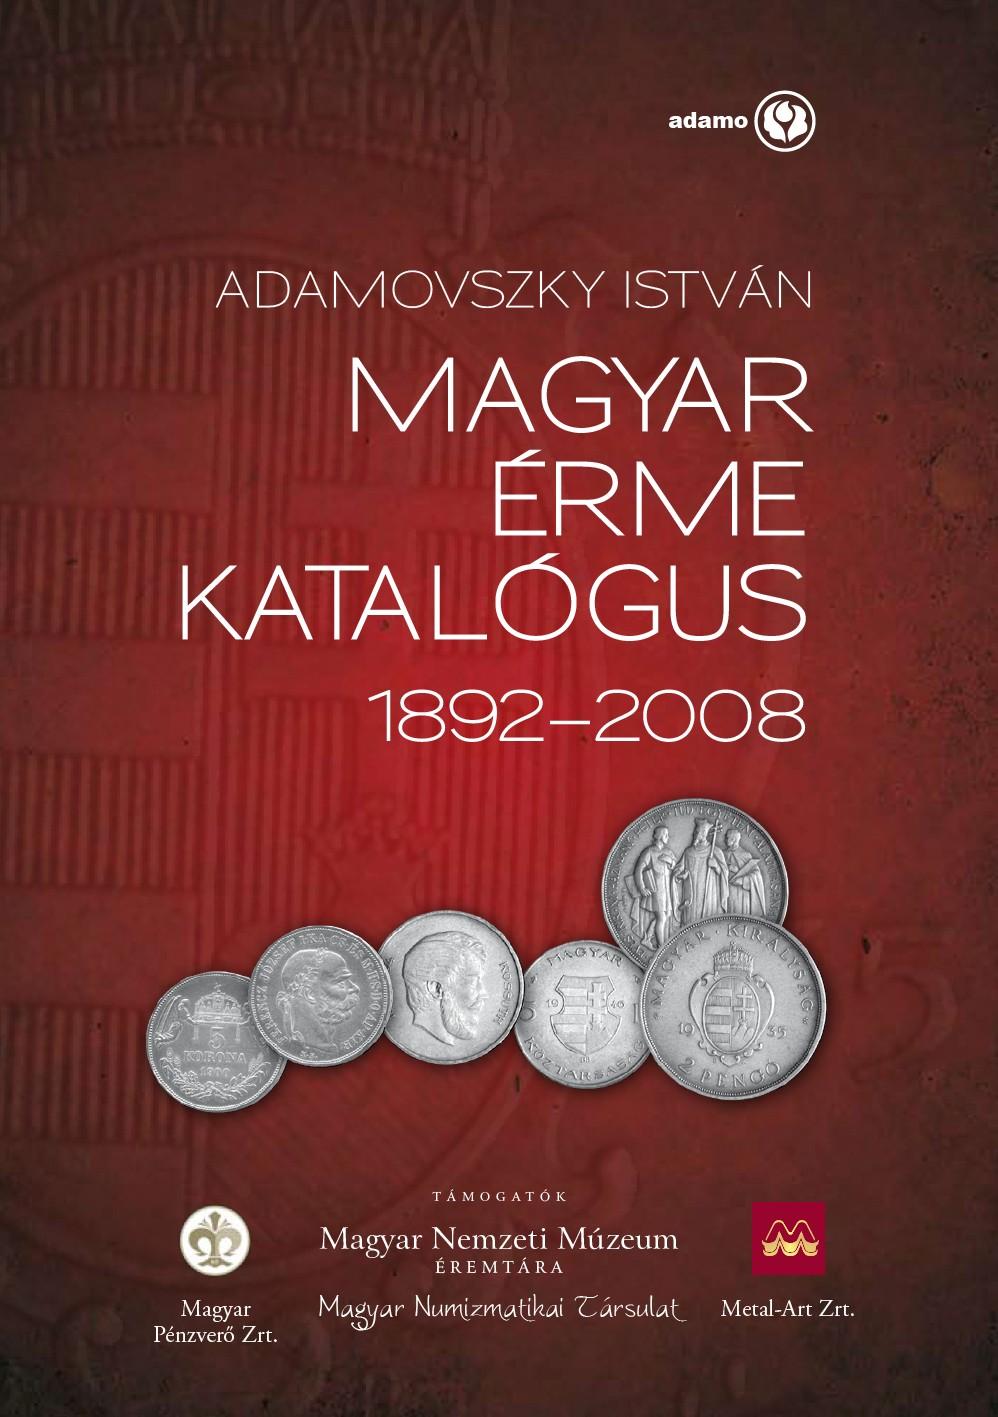 http://www.hamispenzek.hu/konyvek/adamovszky_magyar_erme_katalogus_1892-2008_nagy.jpg